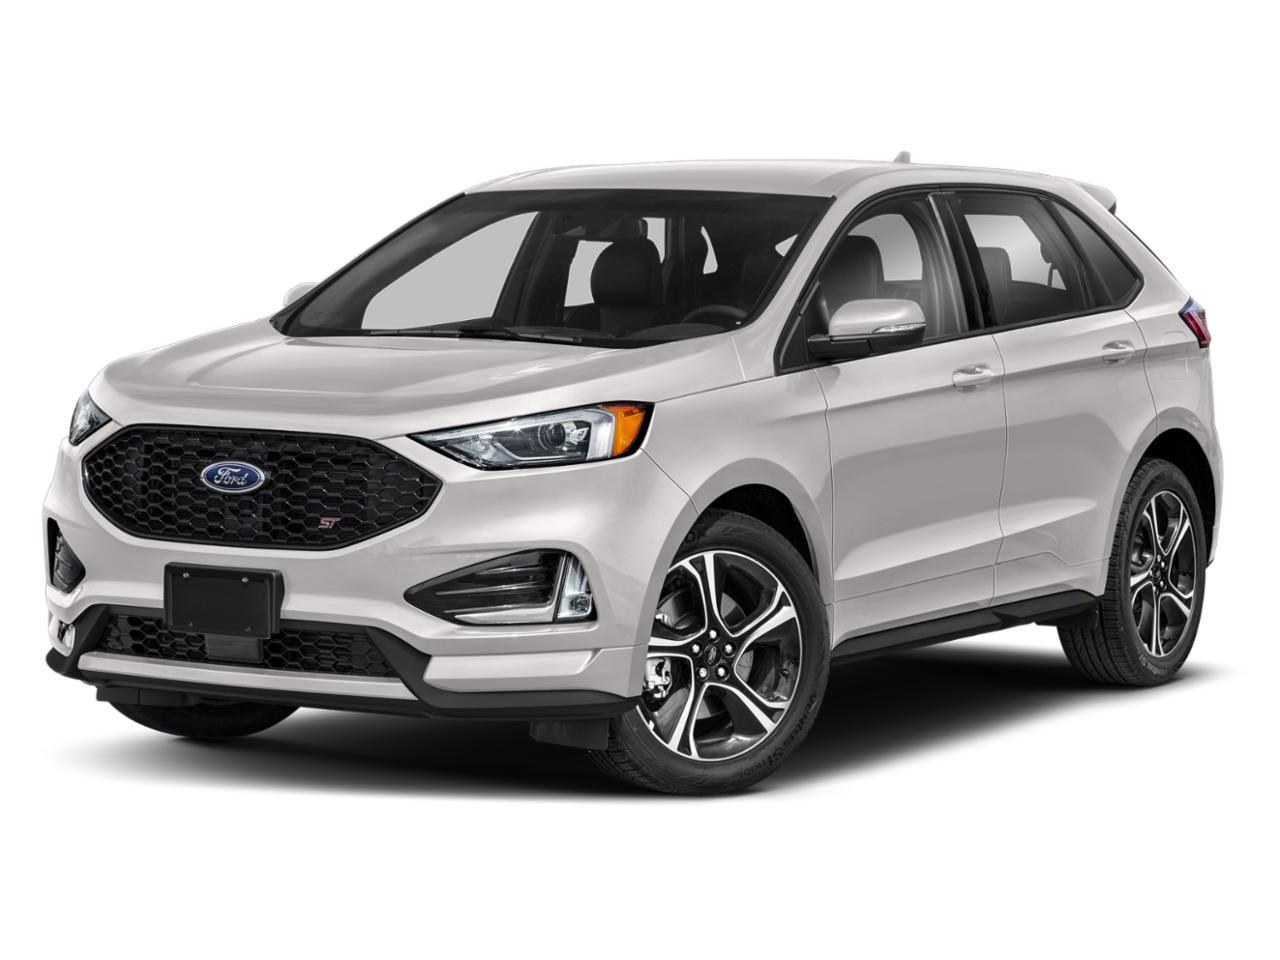 2019 Ford Edge Vehicle Photo in Elyria, OH 44035